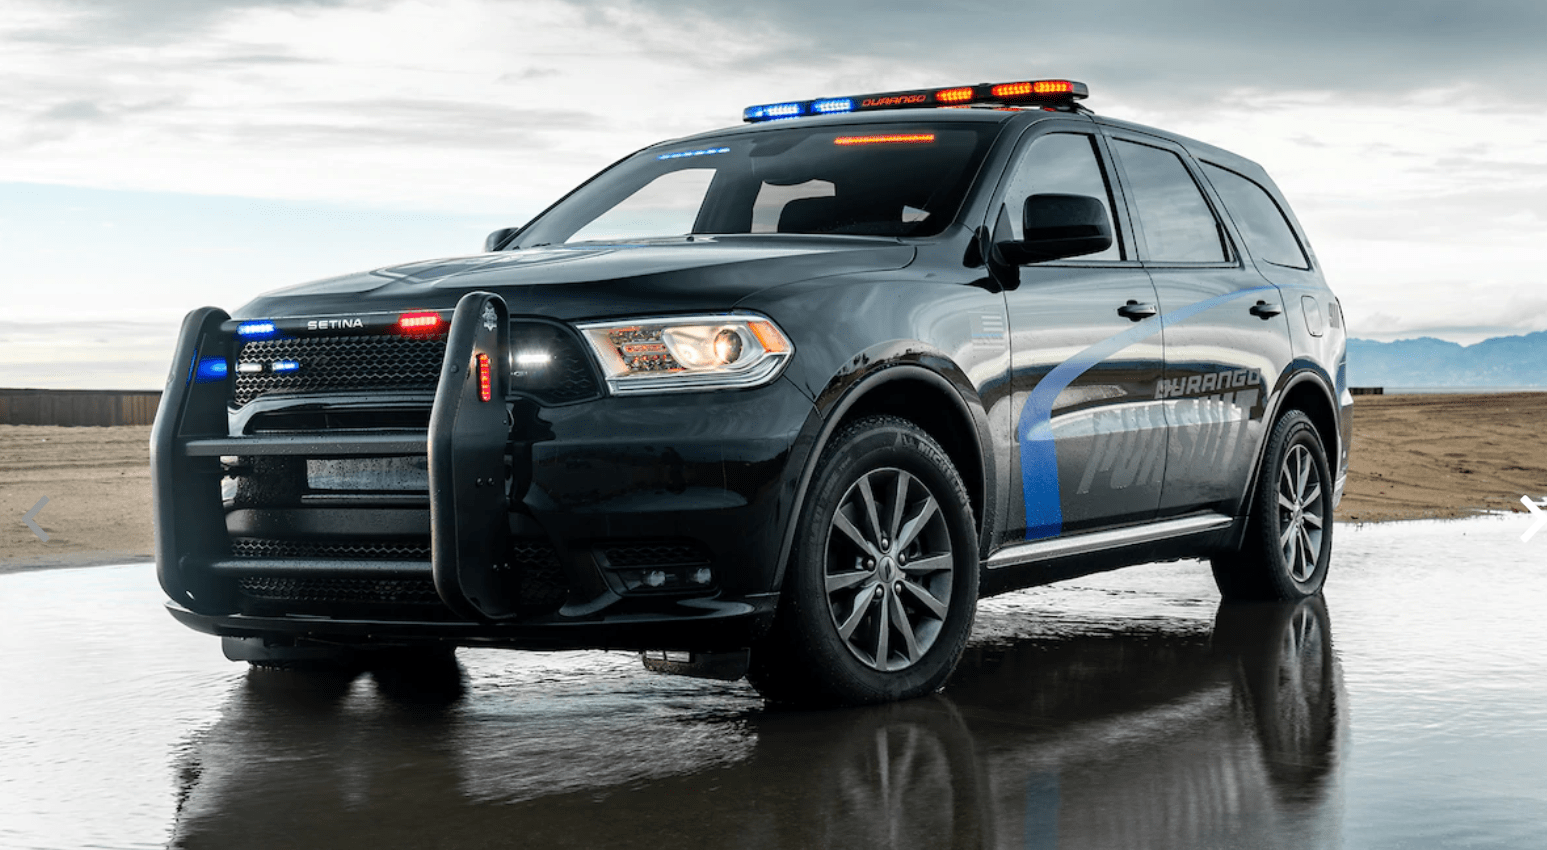 2019 Dodge Durango Pursuit SUV Testing - Law Officer